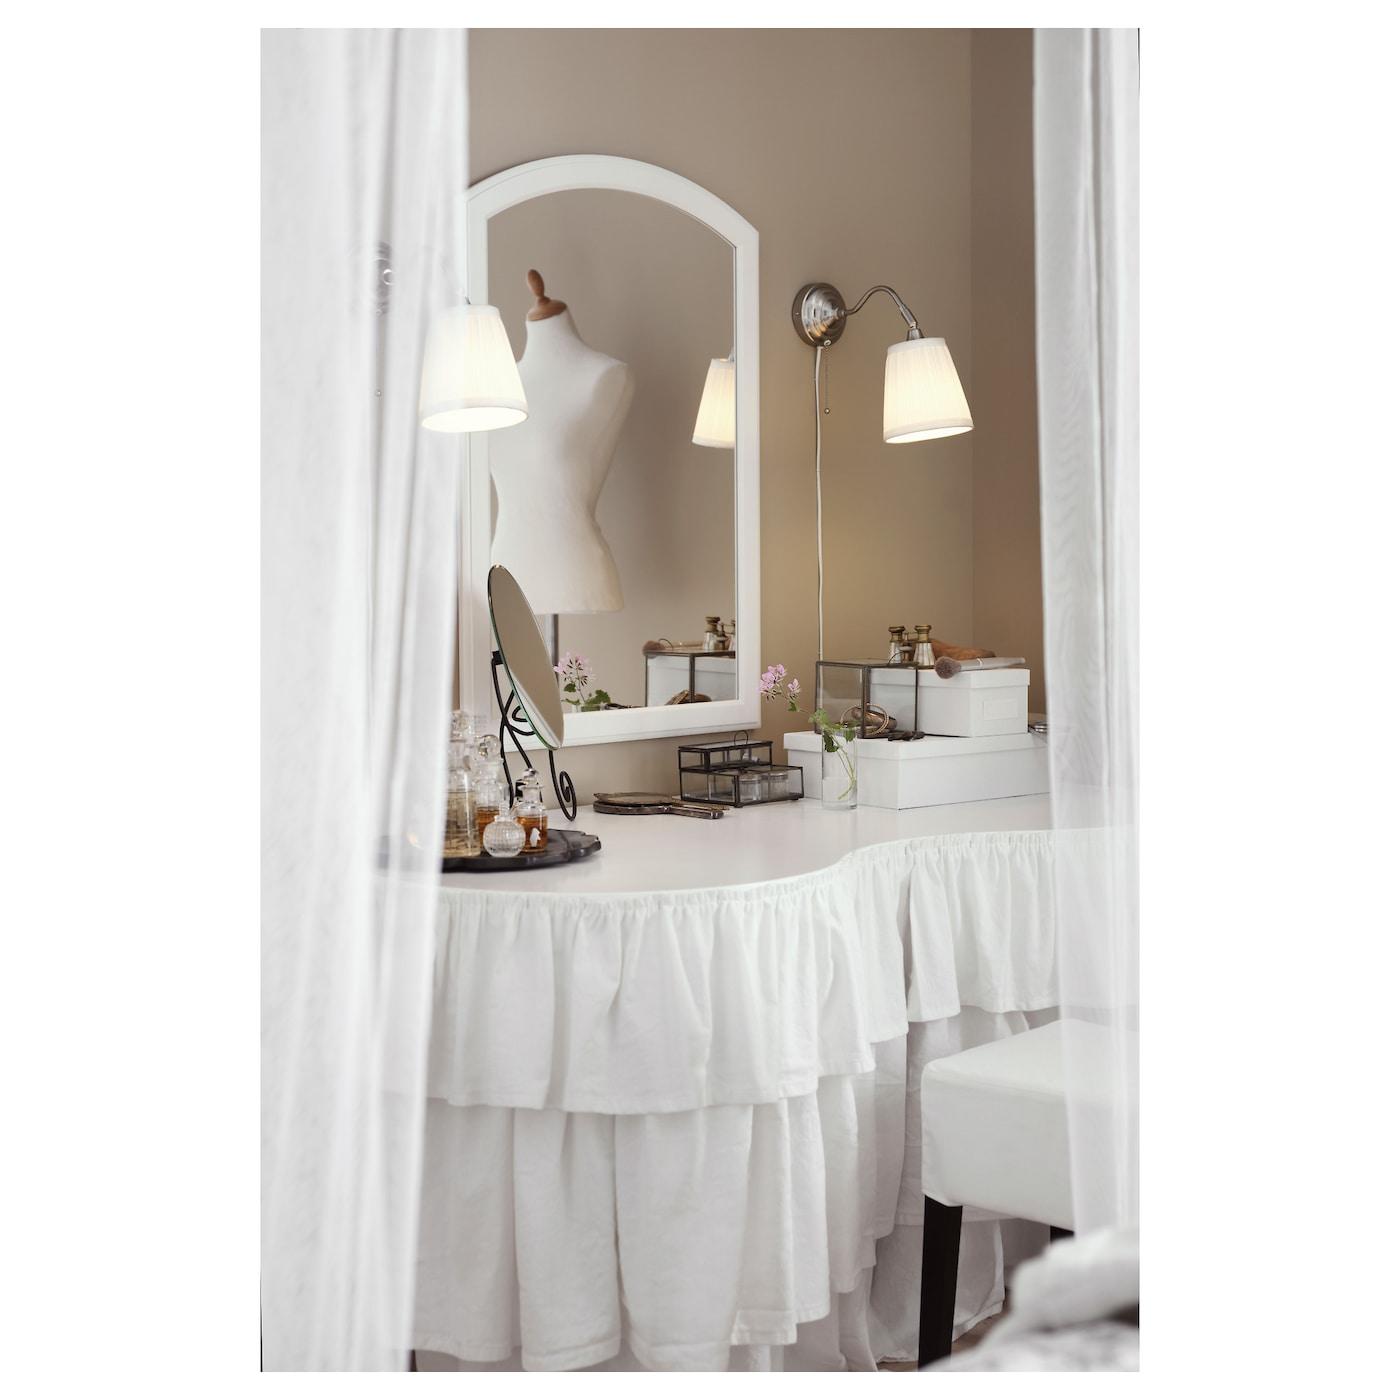 matredal spiegel wit 60x90 cm ikea. Black Bedroom Furniture Sets. Home Design Ideas